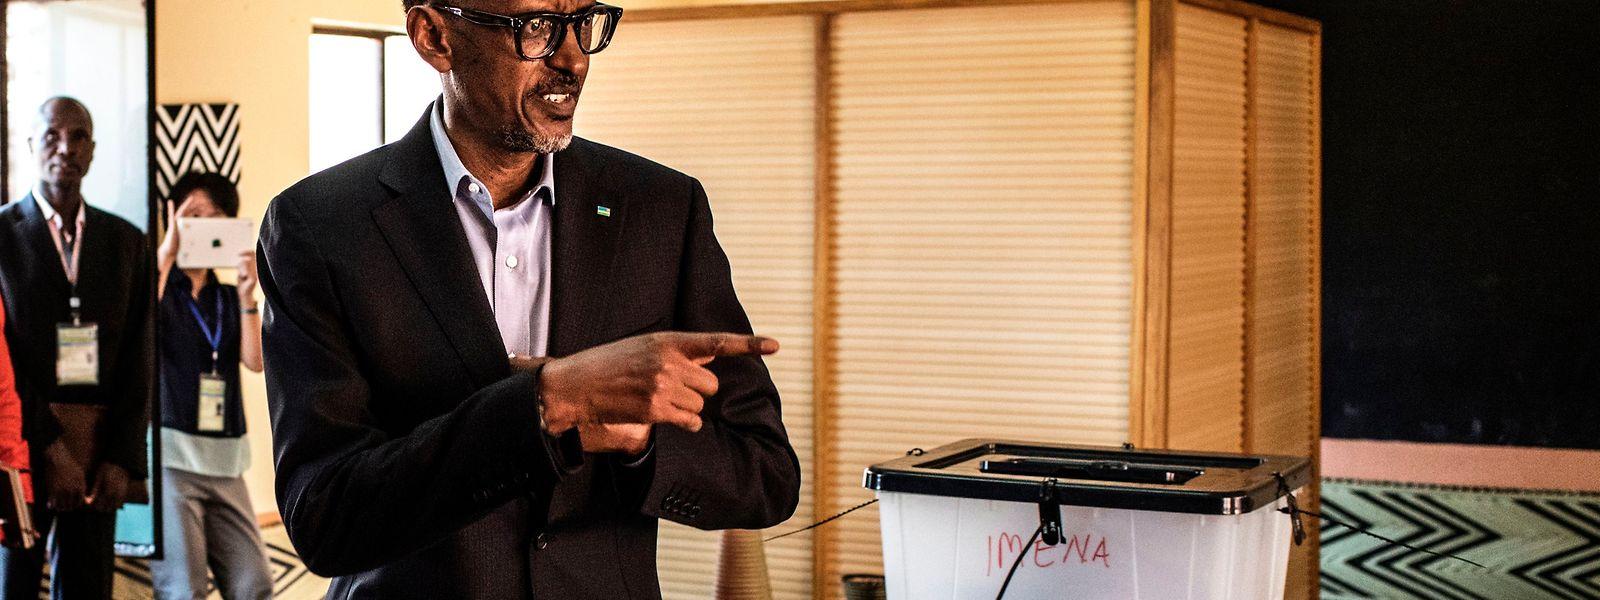 Paul Kagame konnte sich die dritte Amtszeit sichern.